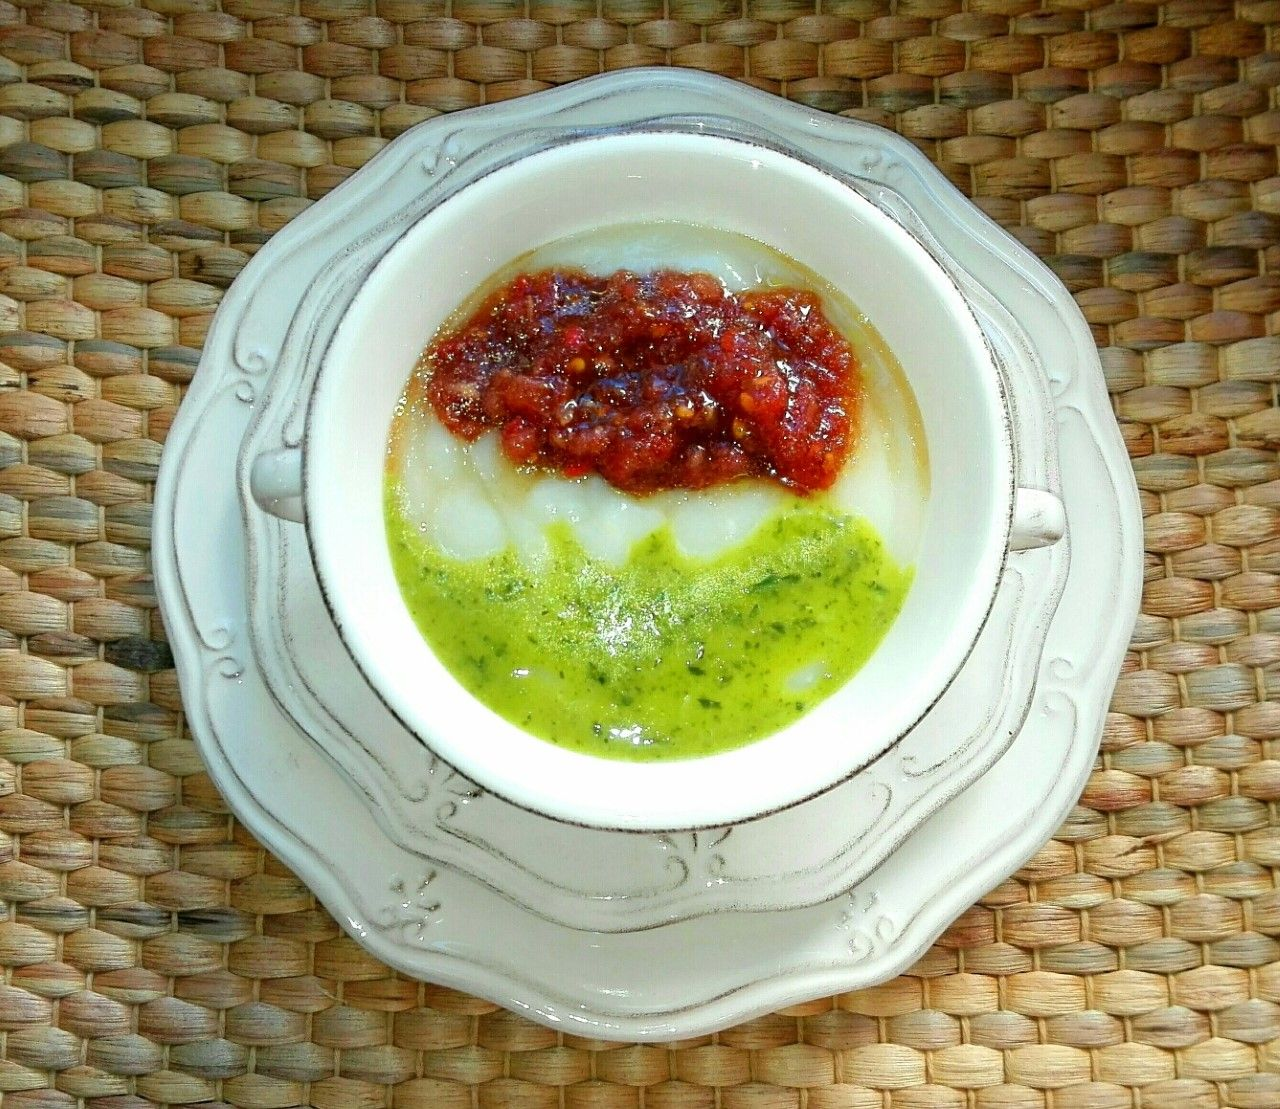 Receta de coliflor sana: Crema en dos aromas